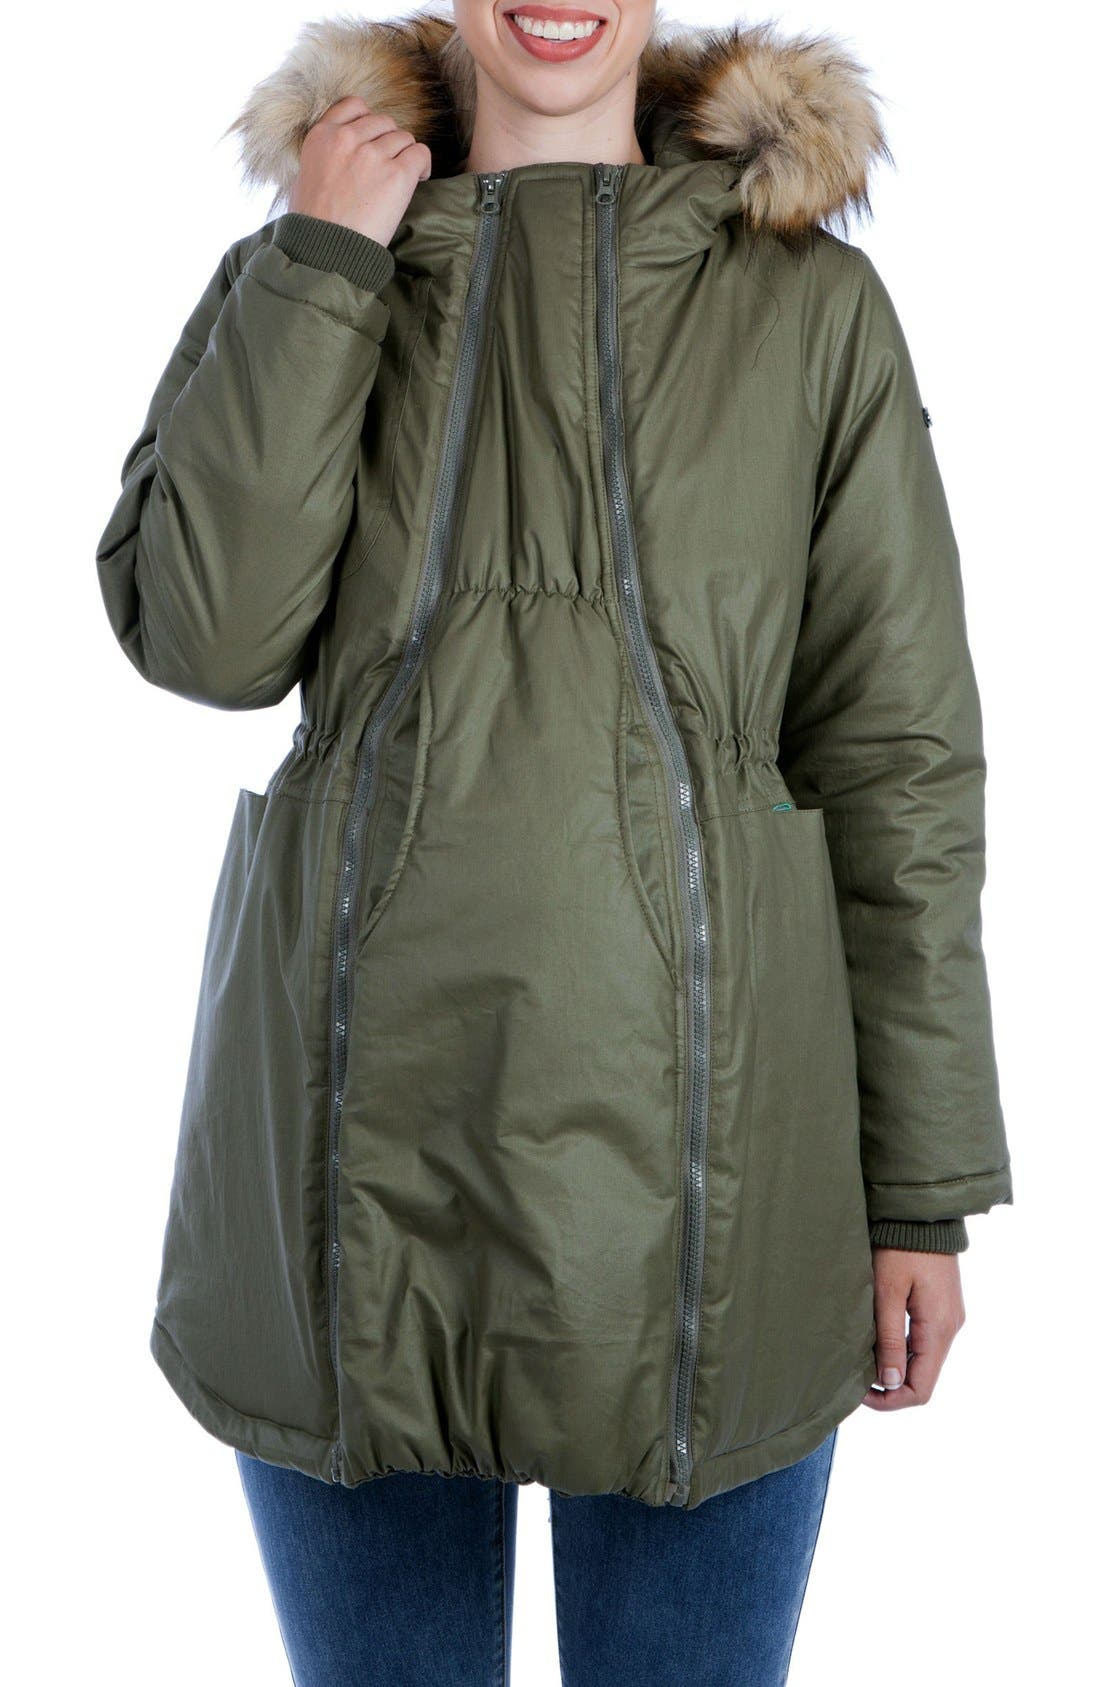 Sofia Waxed 3-in-1 Maternity/Nursing Jacket with Faux Fur Trim,                         Main,                         color, KHAKI GREEN